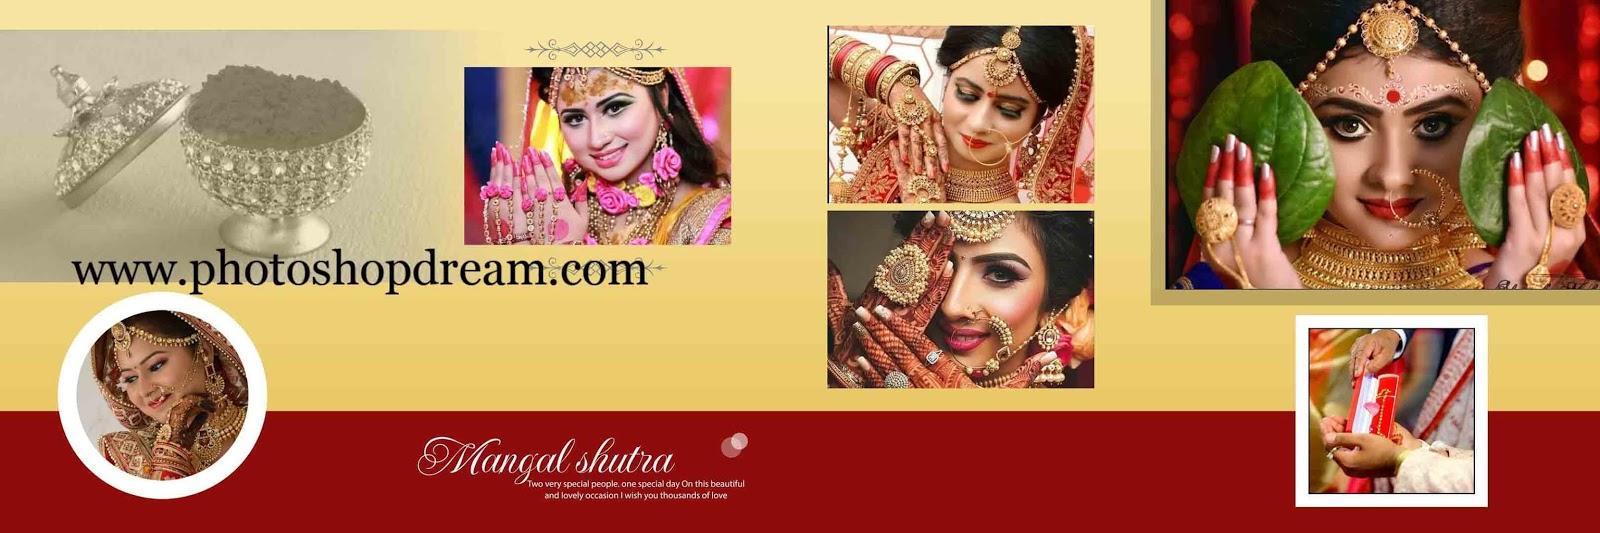 Wedding Album Design Psd Free Download 12x36 Psd Templates Vol 1